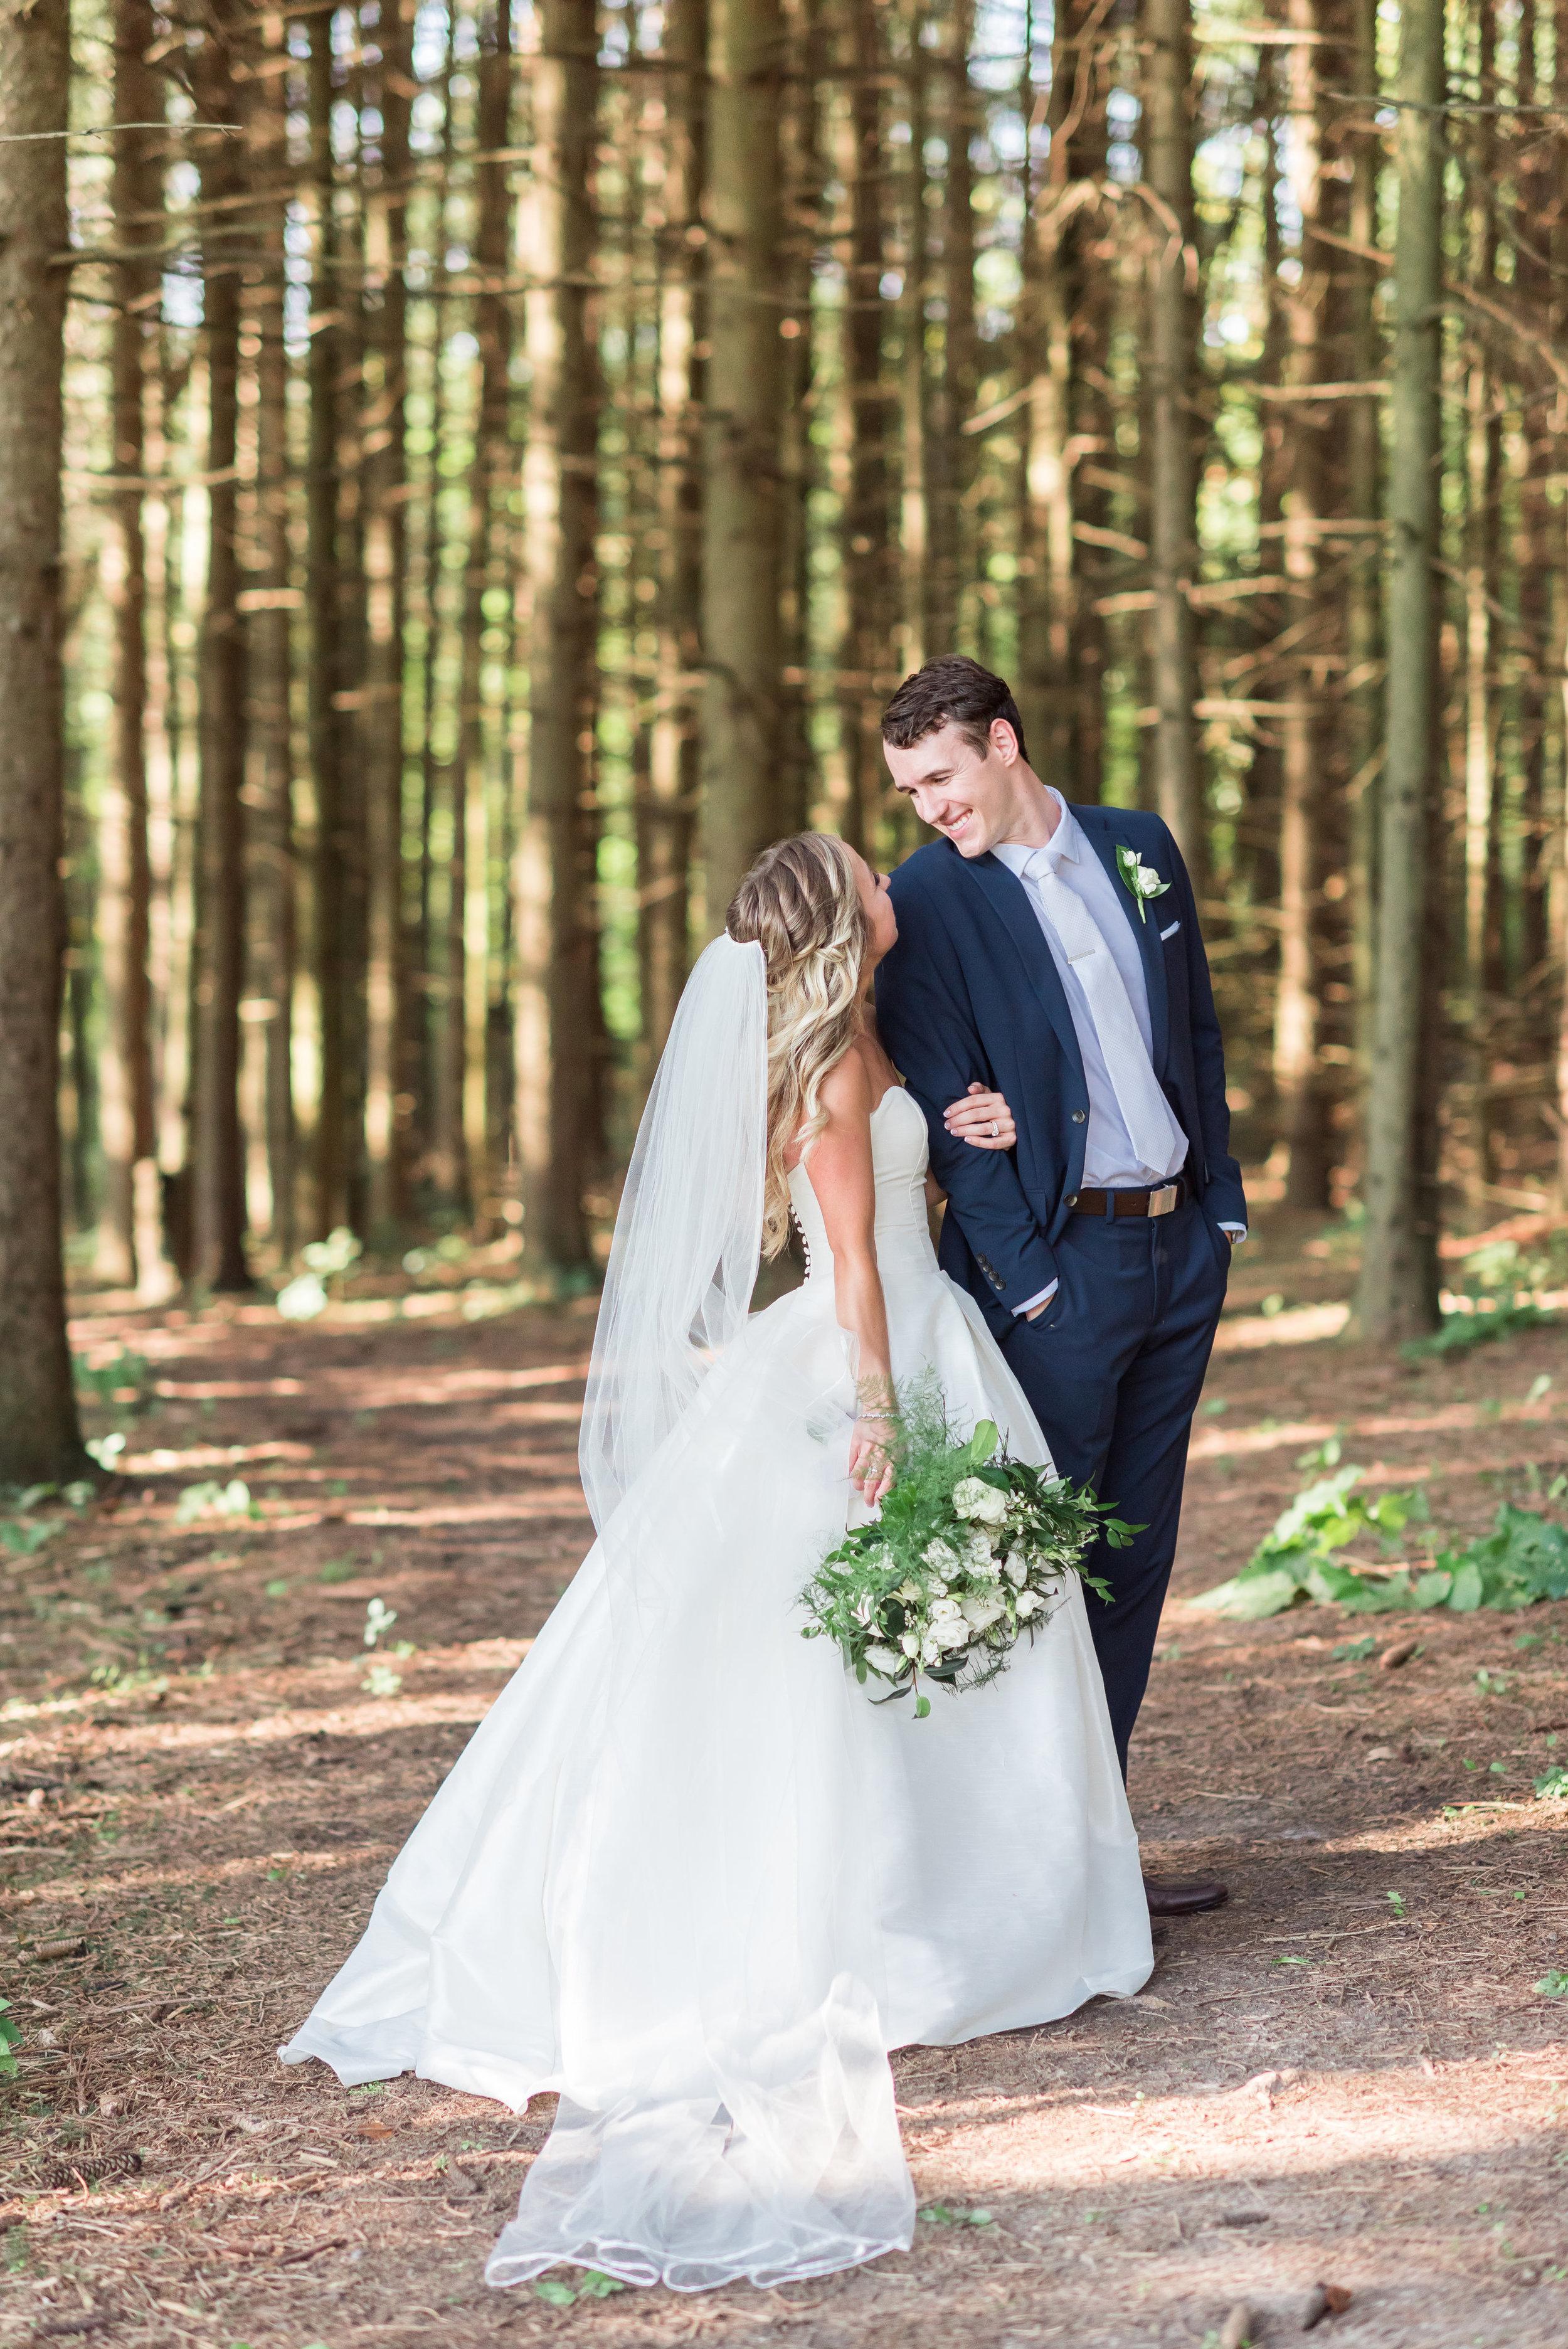 The Dugenske Wedding 9 15 18-0655.jpg